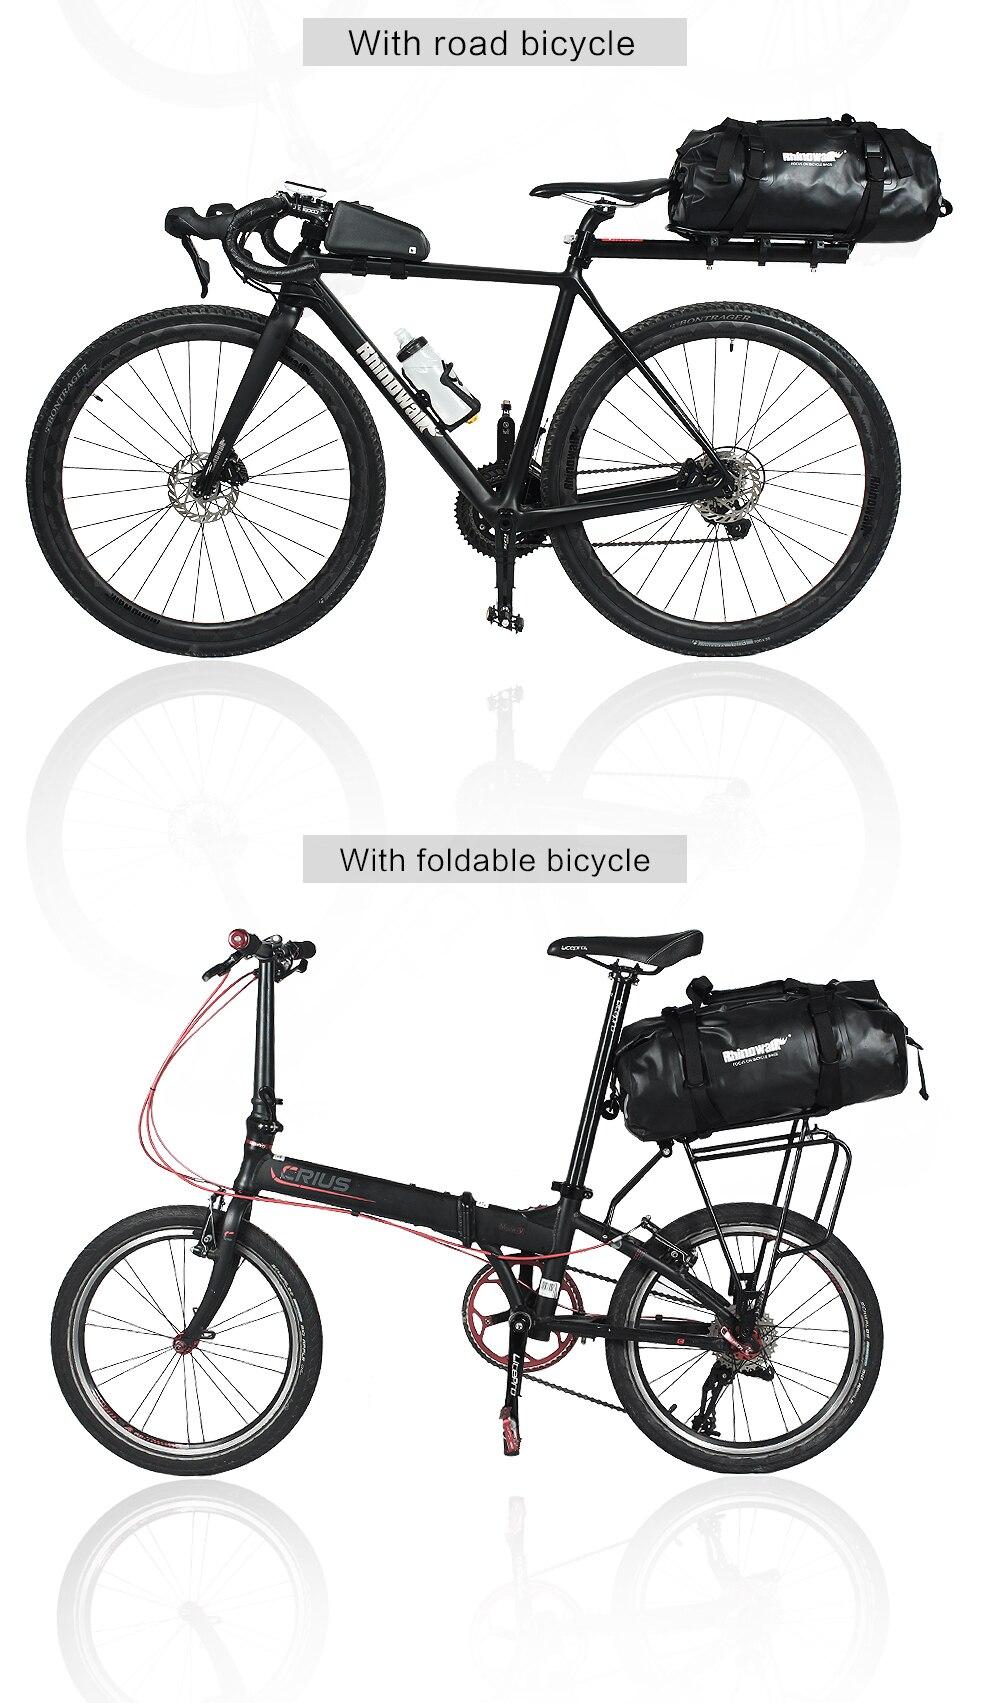 Rhinowalk Bicycle Luggage Bags 20L Full Waterproof for Road Bike Rear Rack Trunk Cycling Saddle Storage Pannier Multi Travel Bag (12)